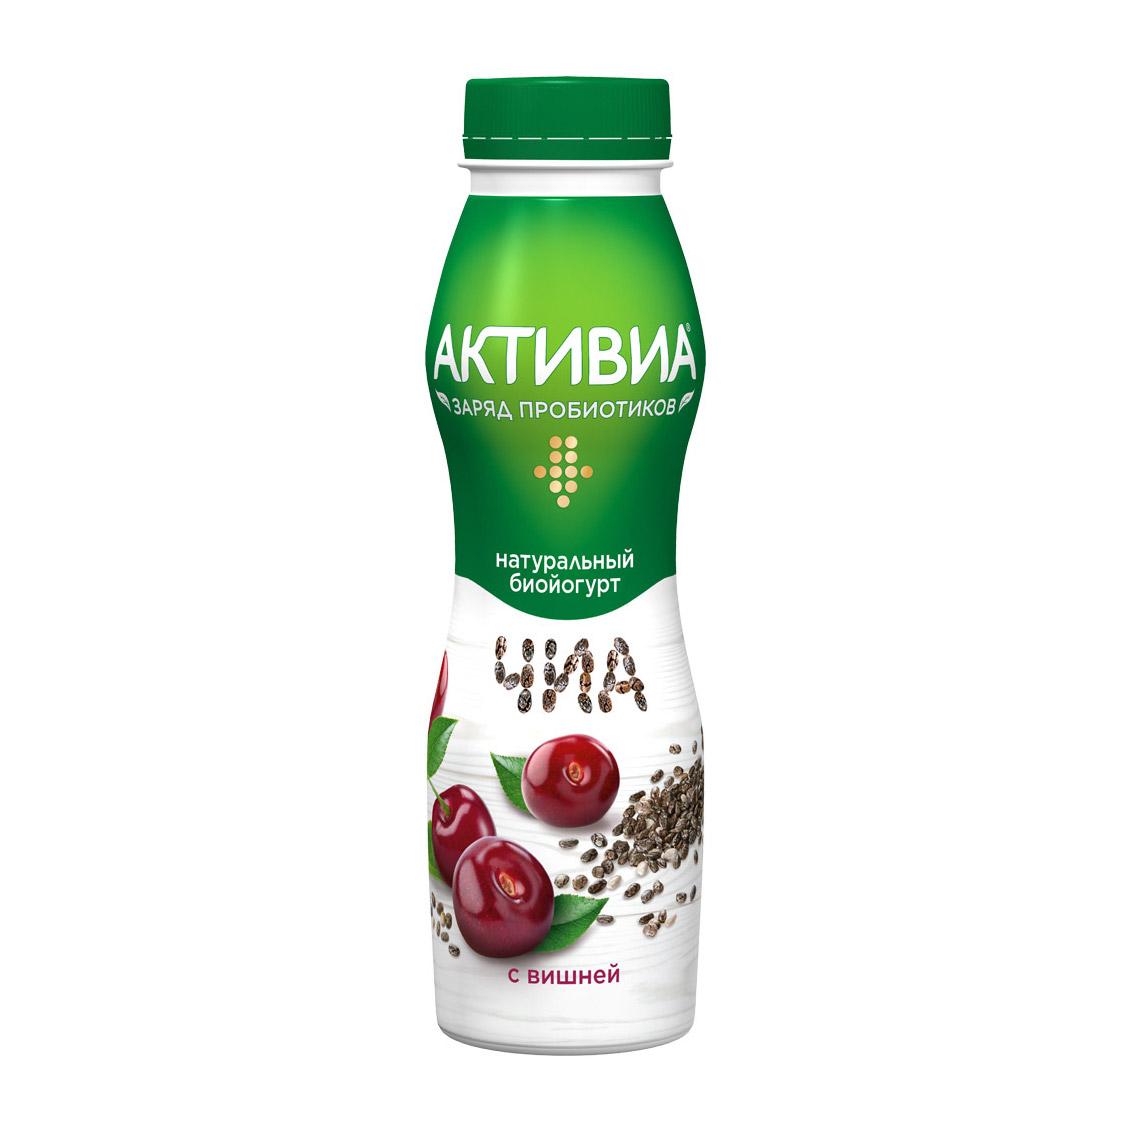 Биойогурт Активиа с вишней и семенами чиа 2,1% 260 г биойогурт активиа цитрусовый микс киноа 2 9% 150 г